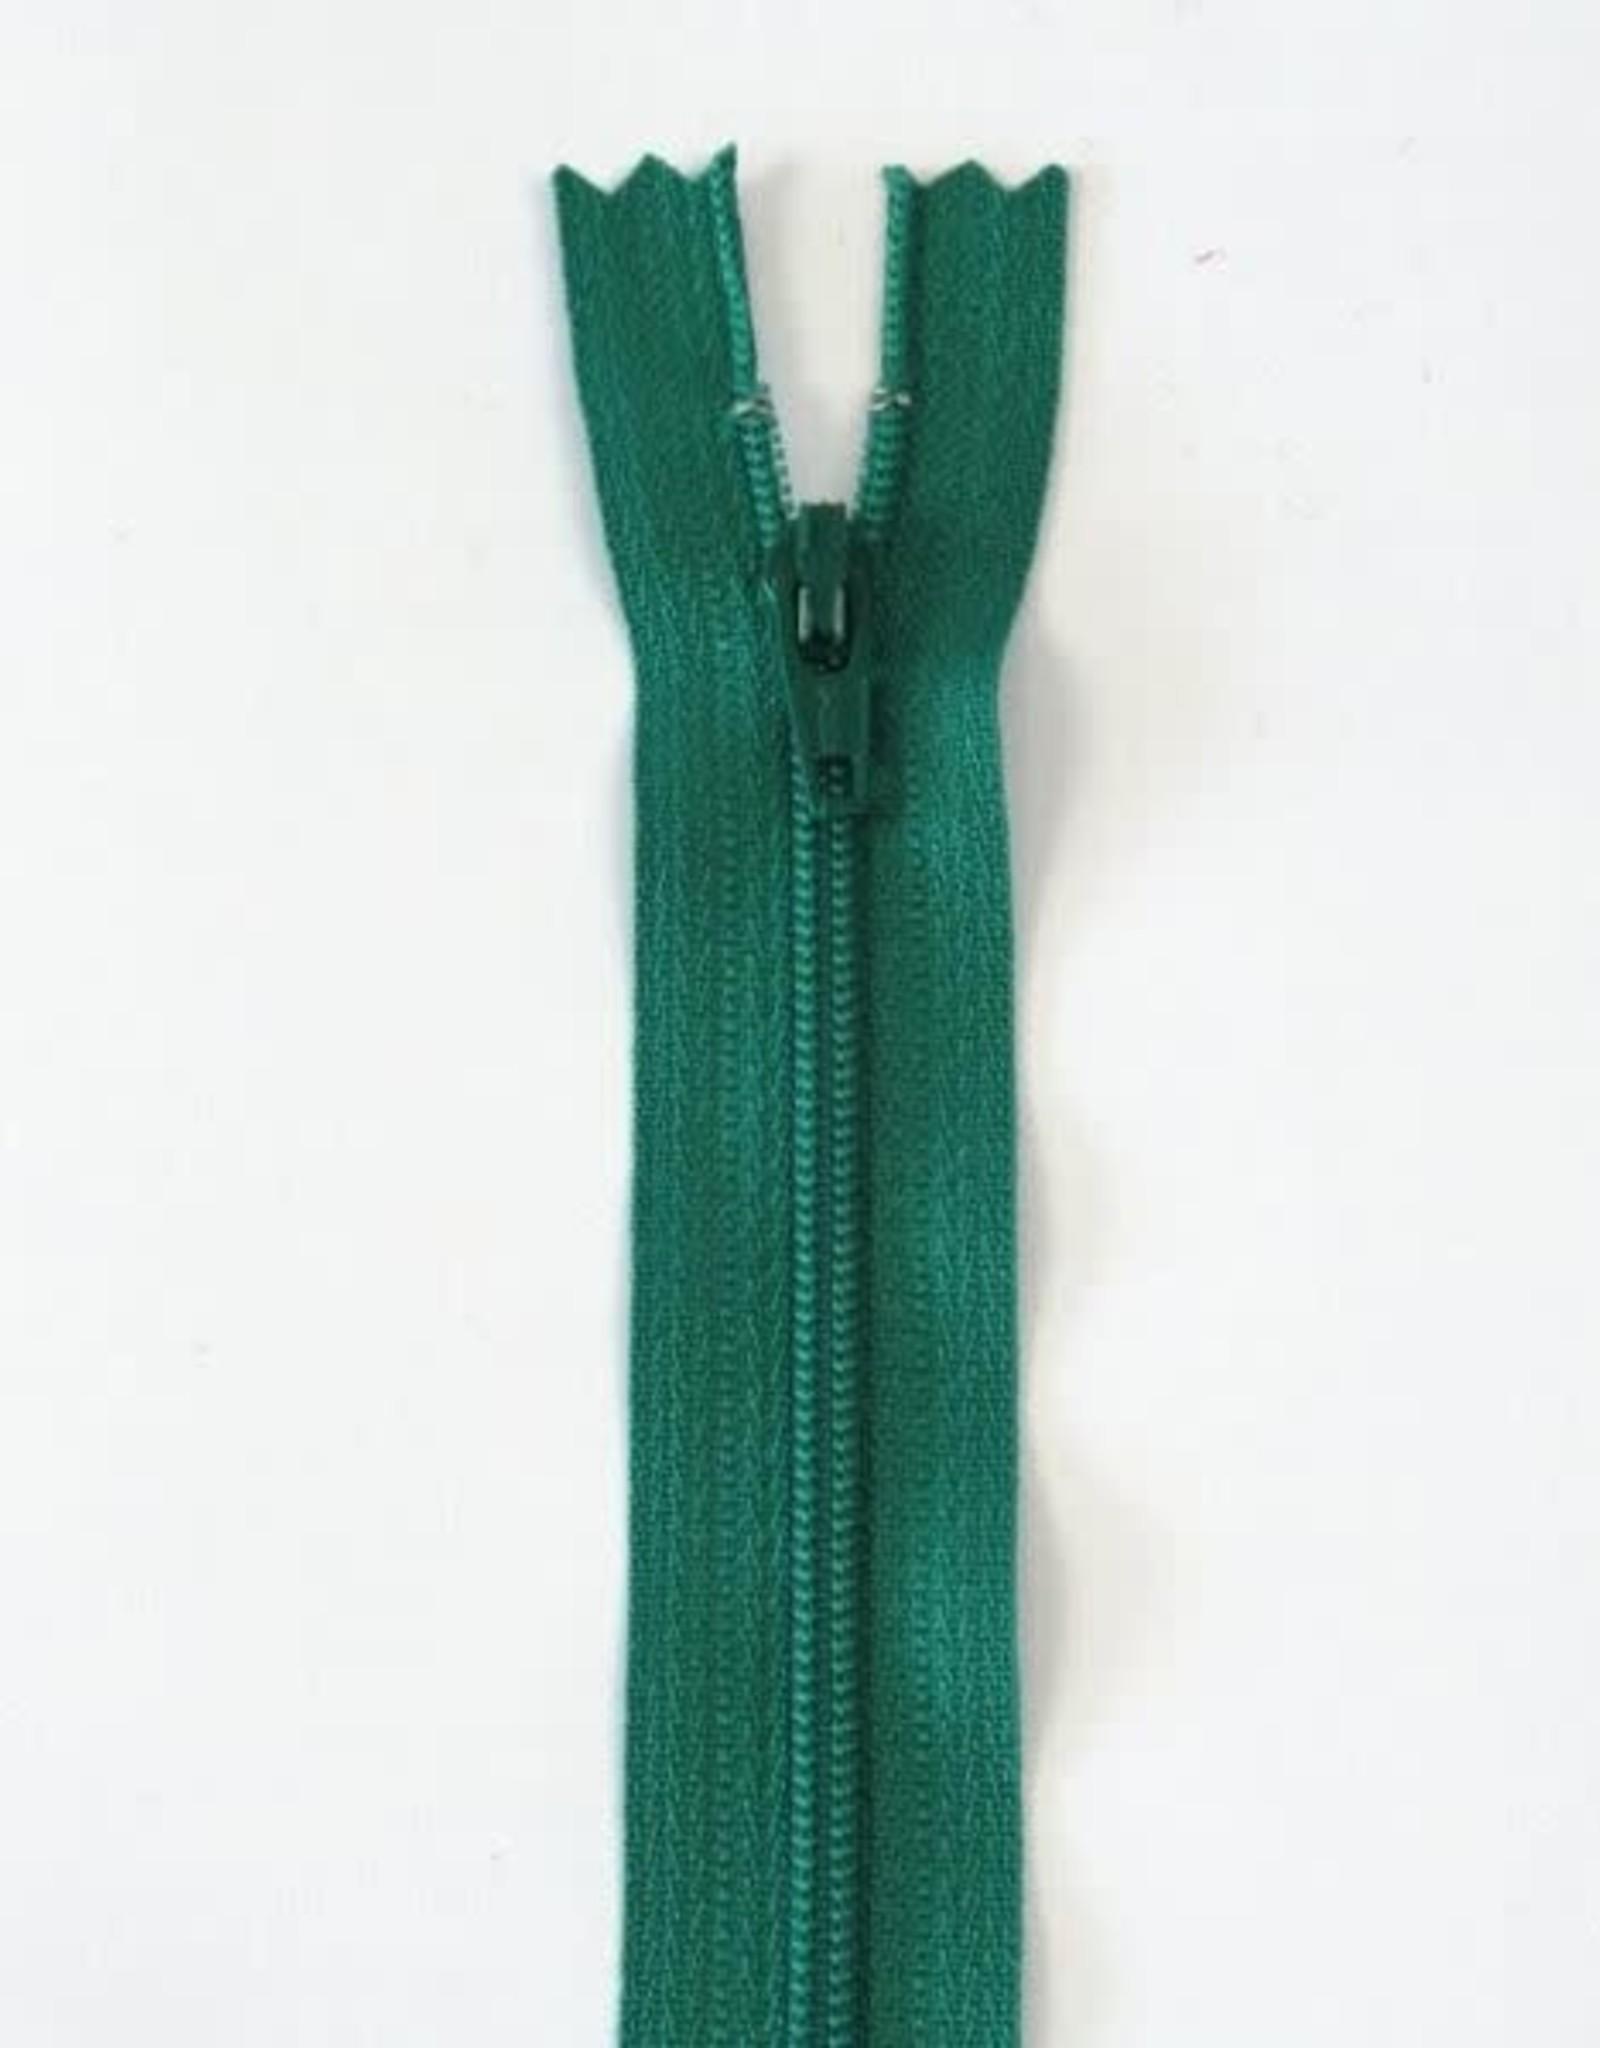 YKK Spiraalrits niet-DB 3mm grasgroen 540-22cm